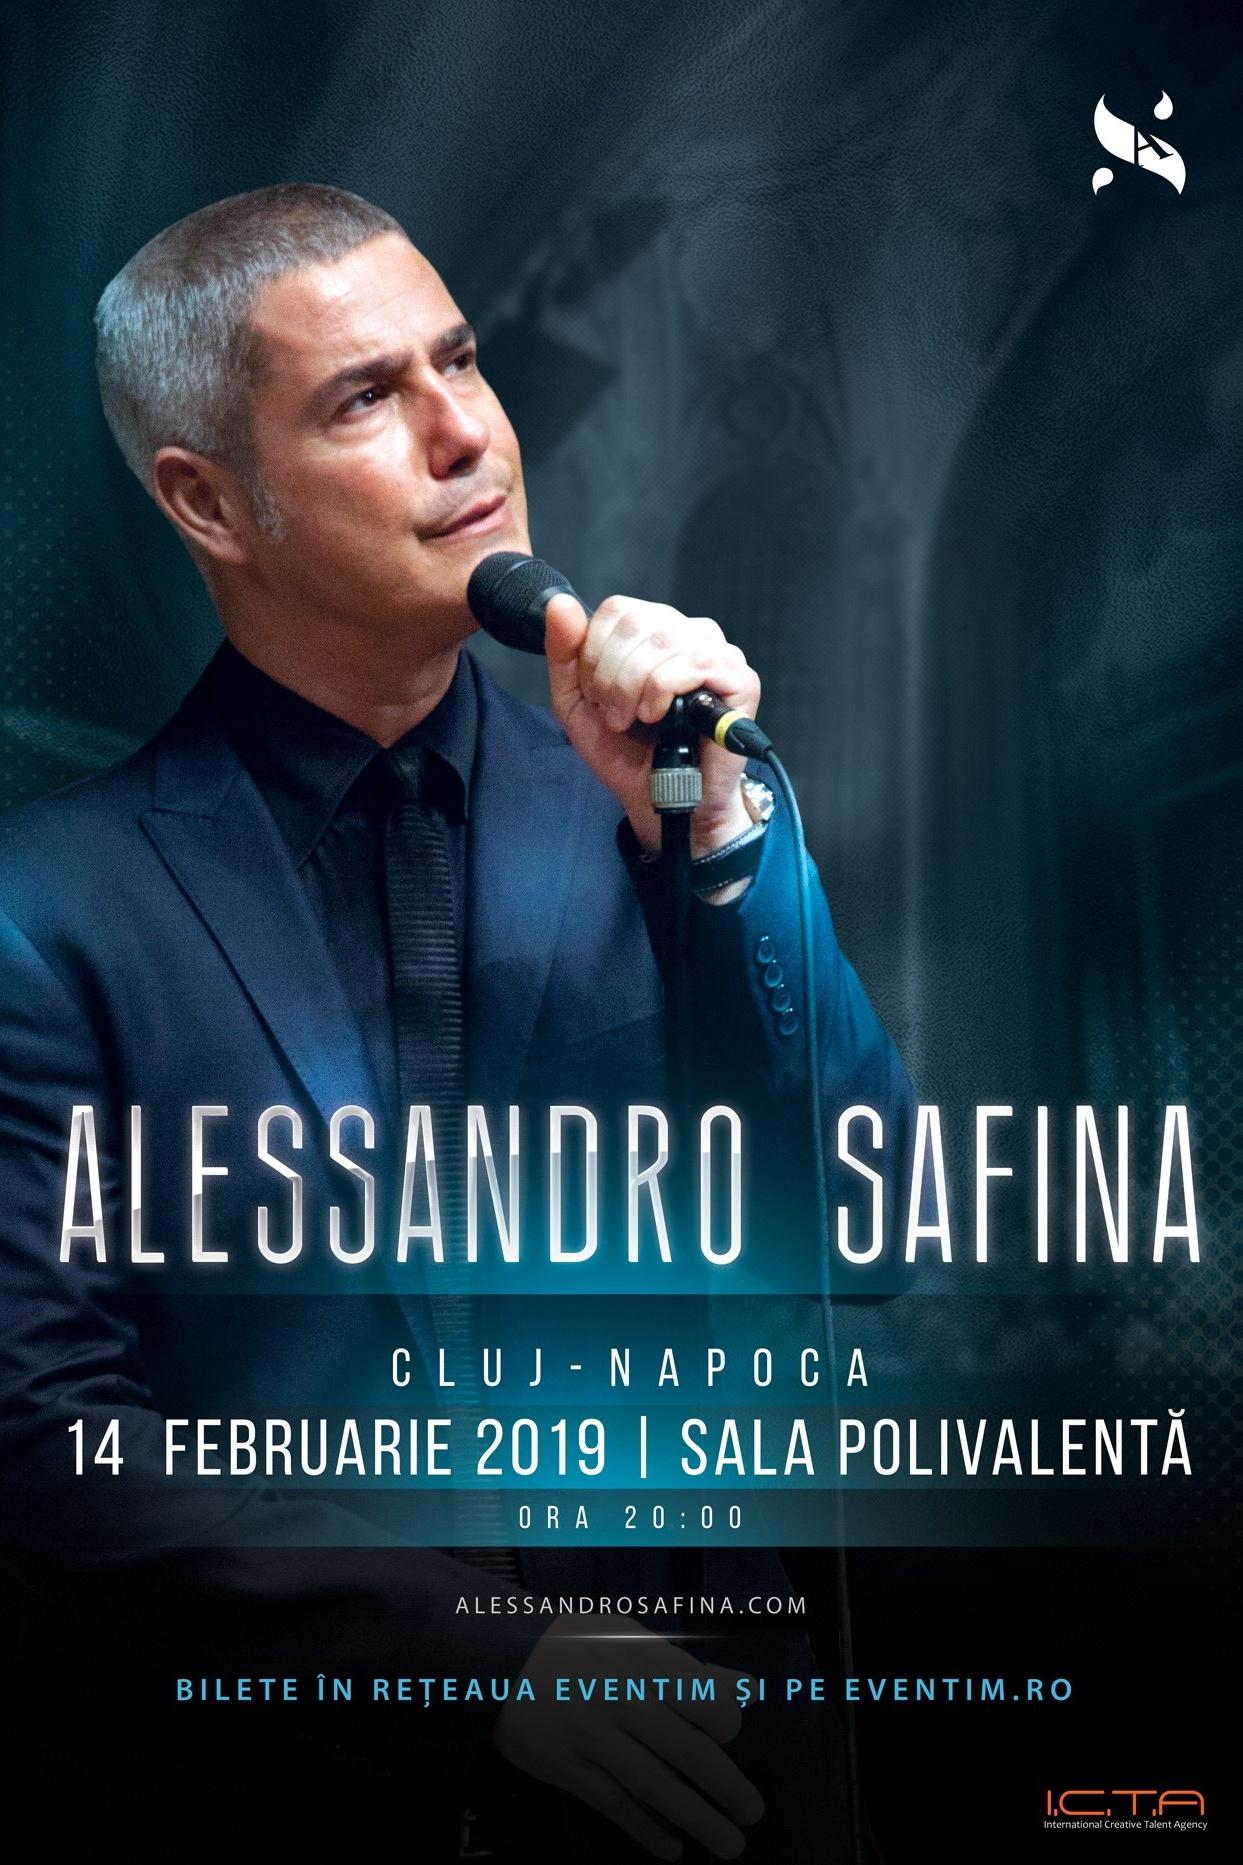 Alessandro Safina la BT Arena (Sala Polivalentă) Cluj-Napoca